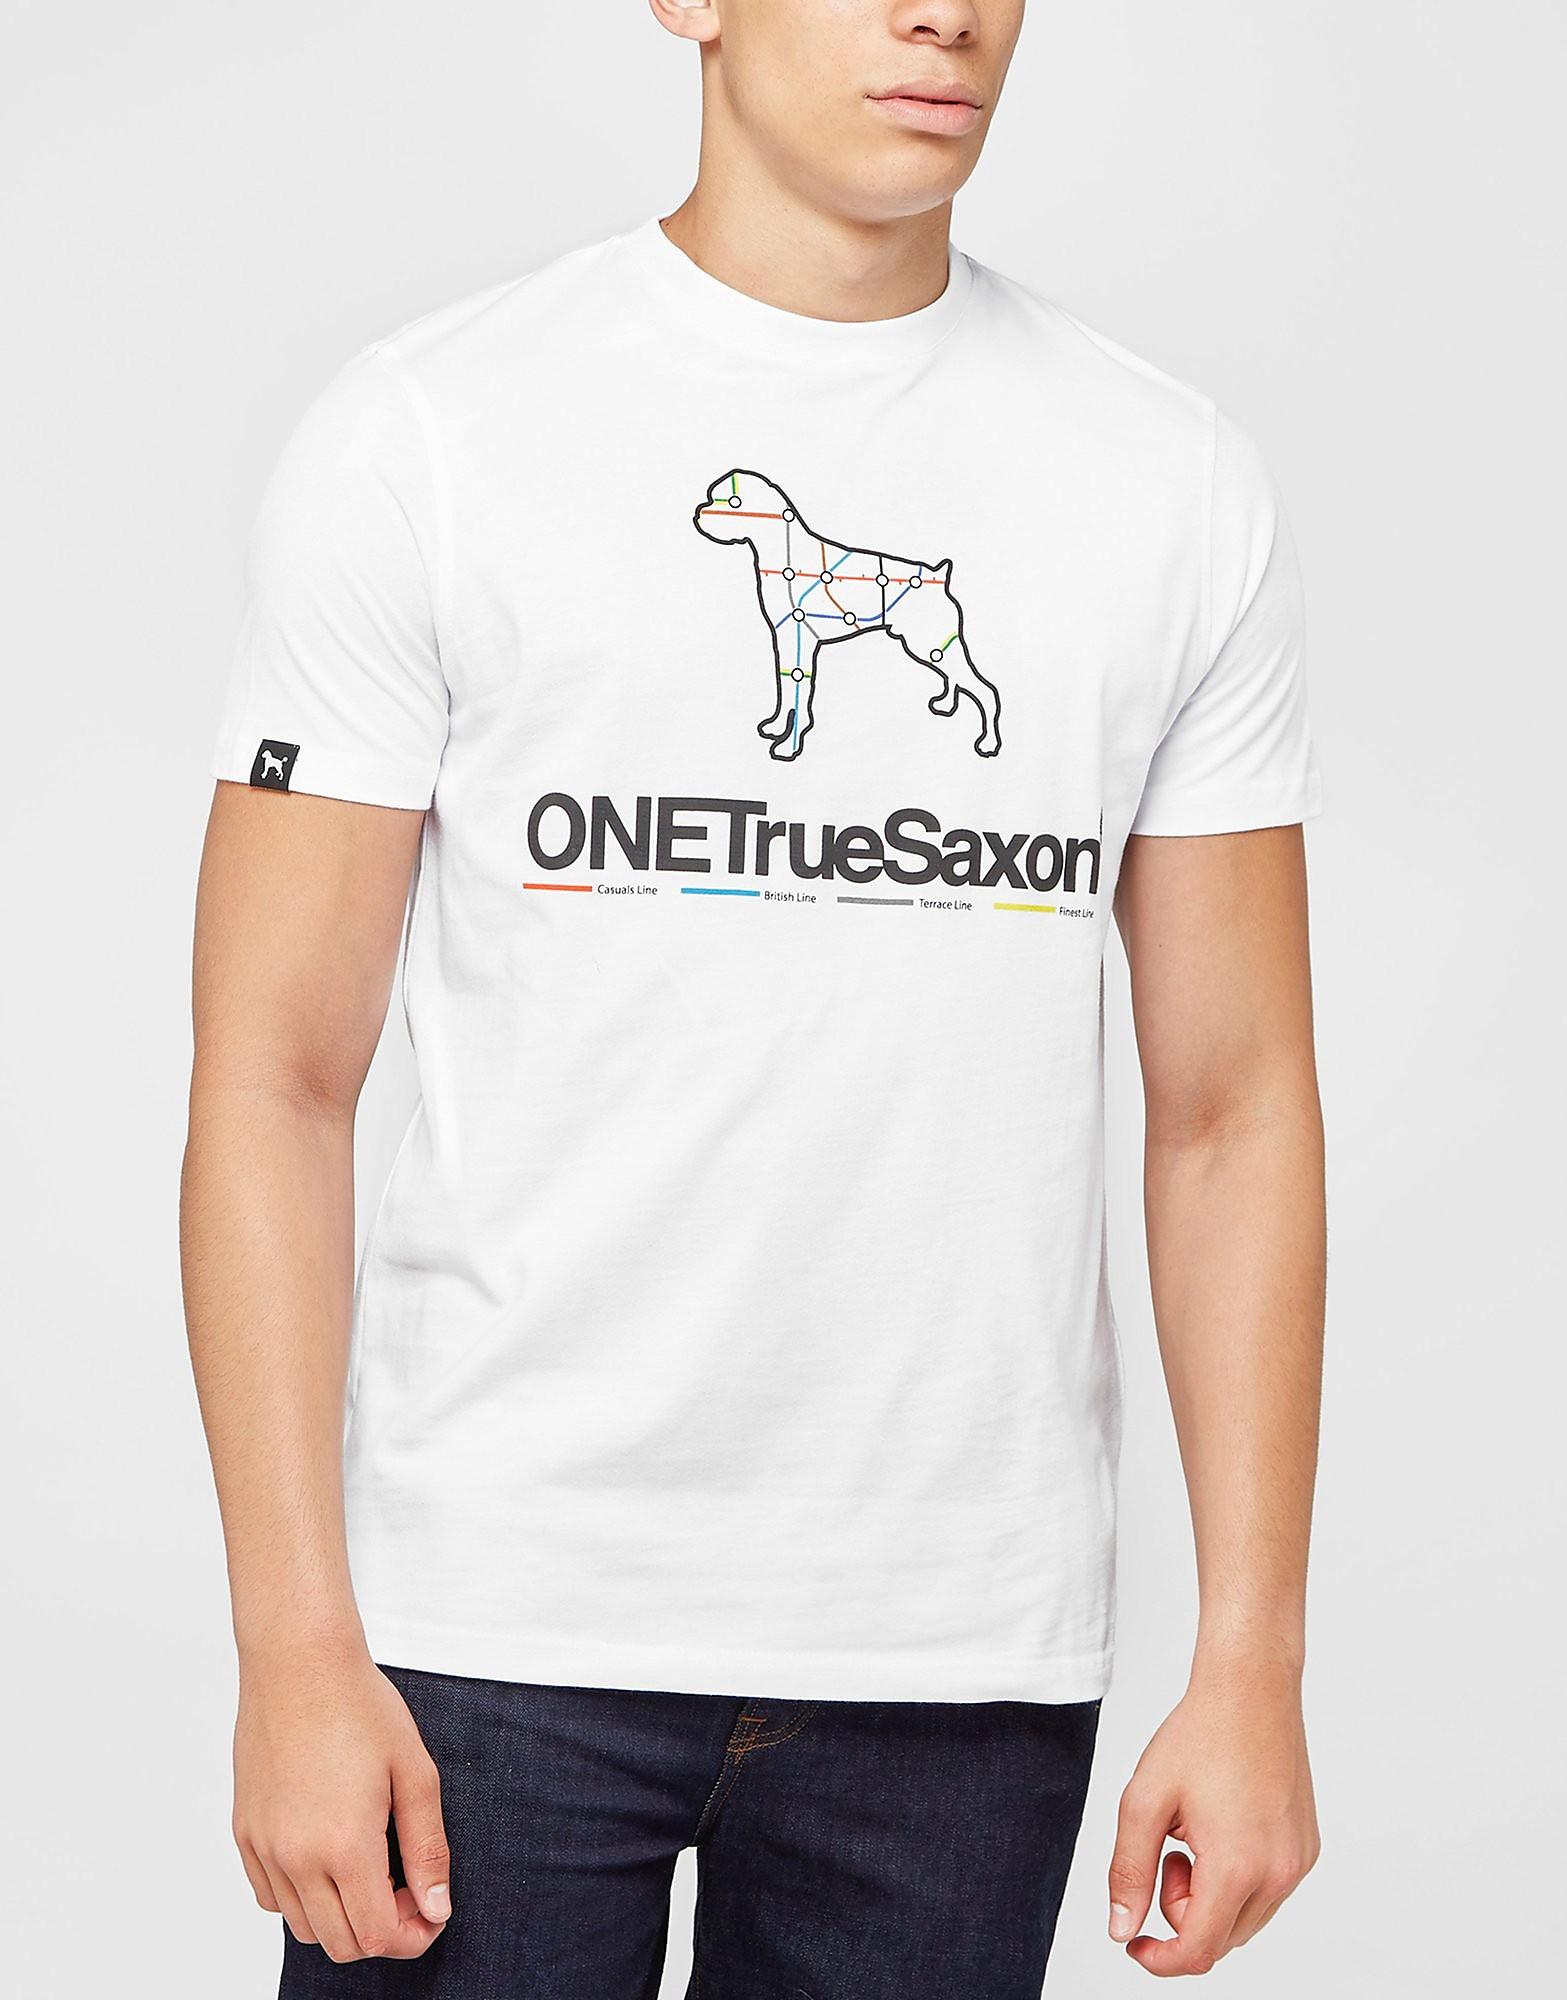 One True Saxon Station T-Shirt - Exclusive